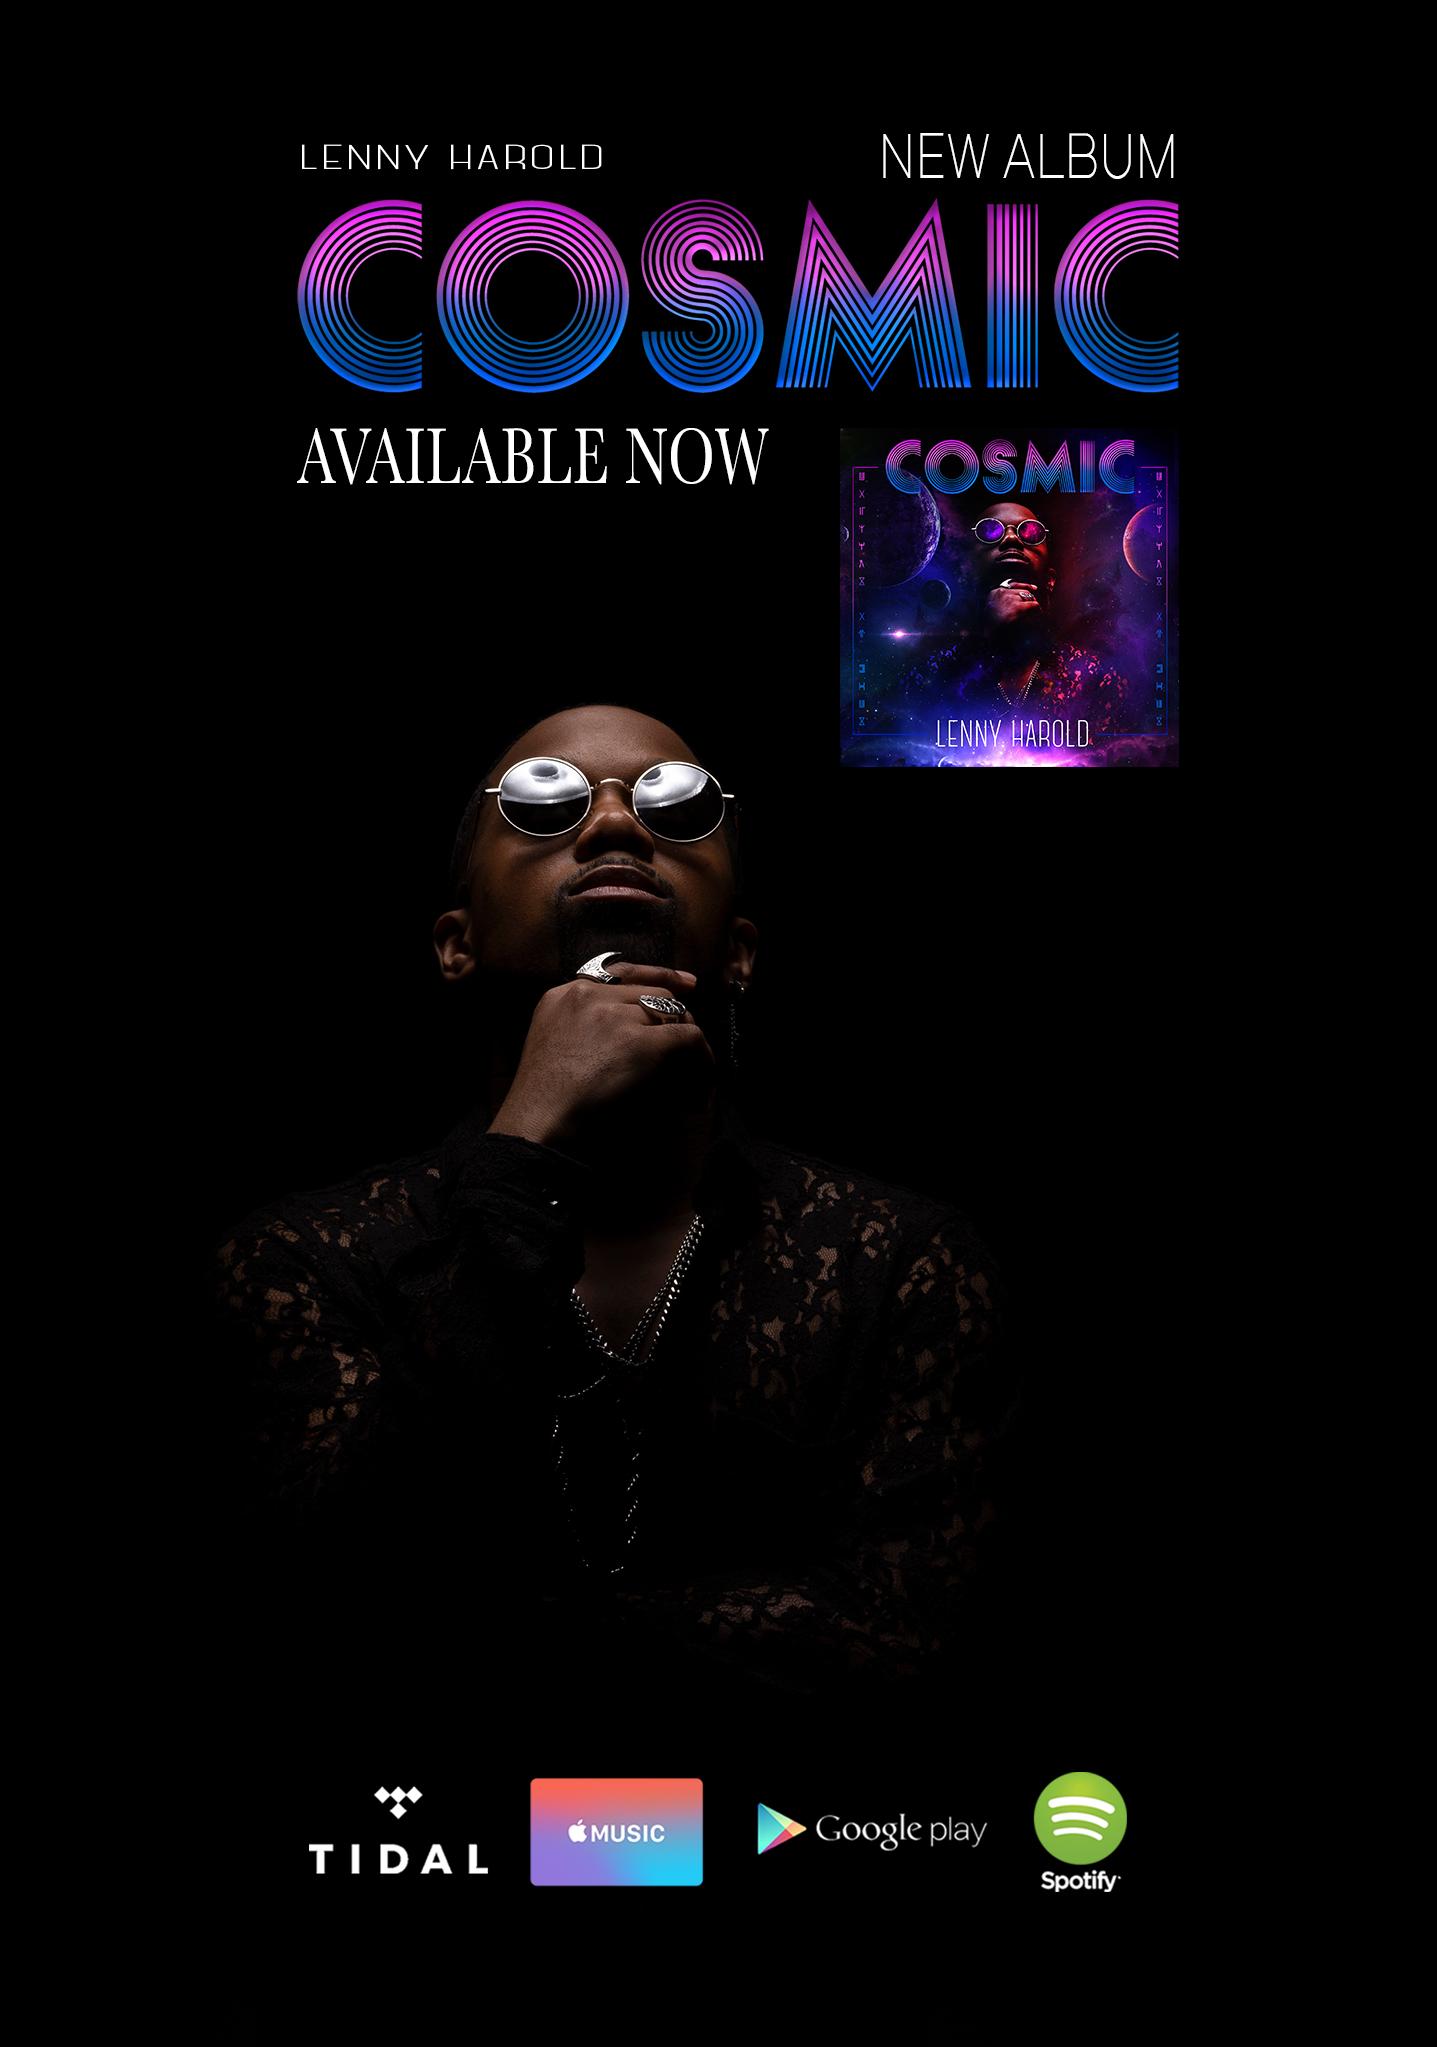 Lenny Harold Cosmic album